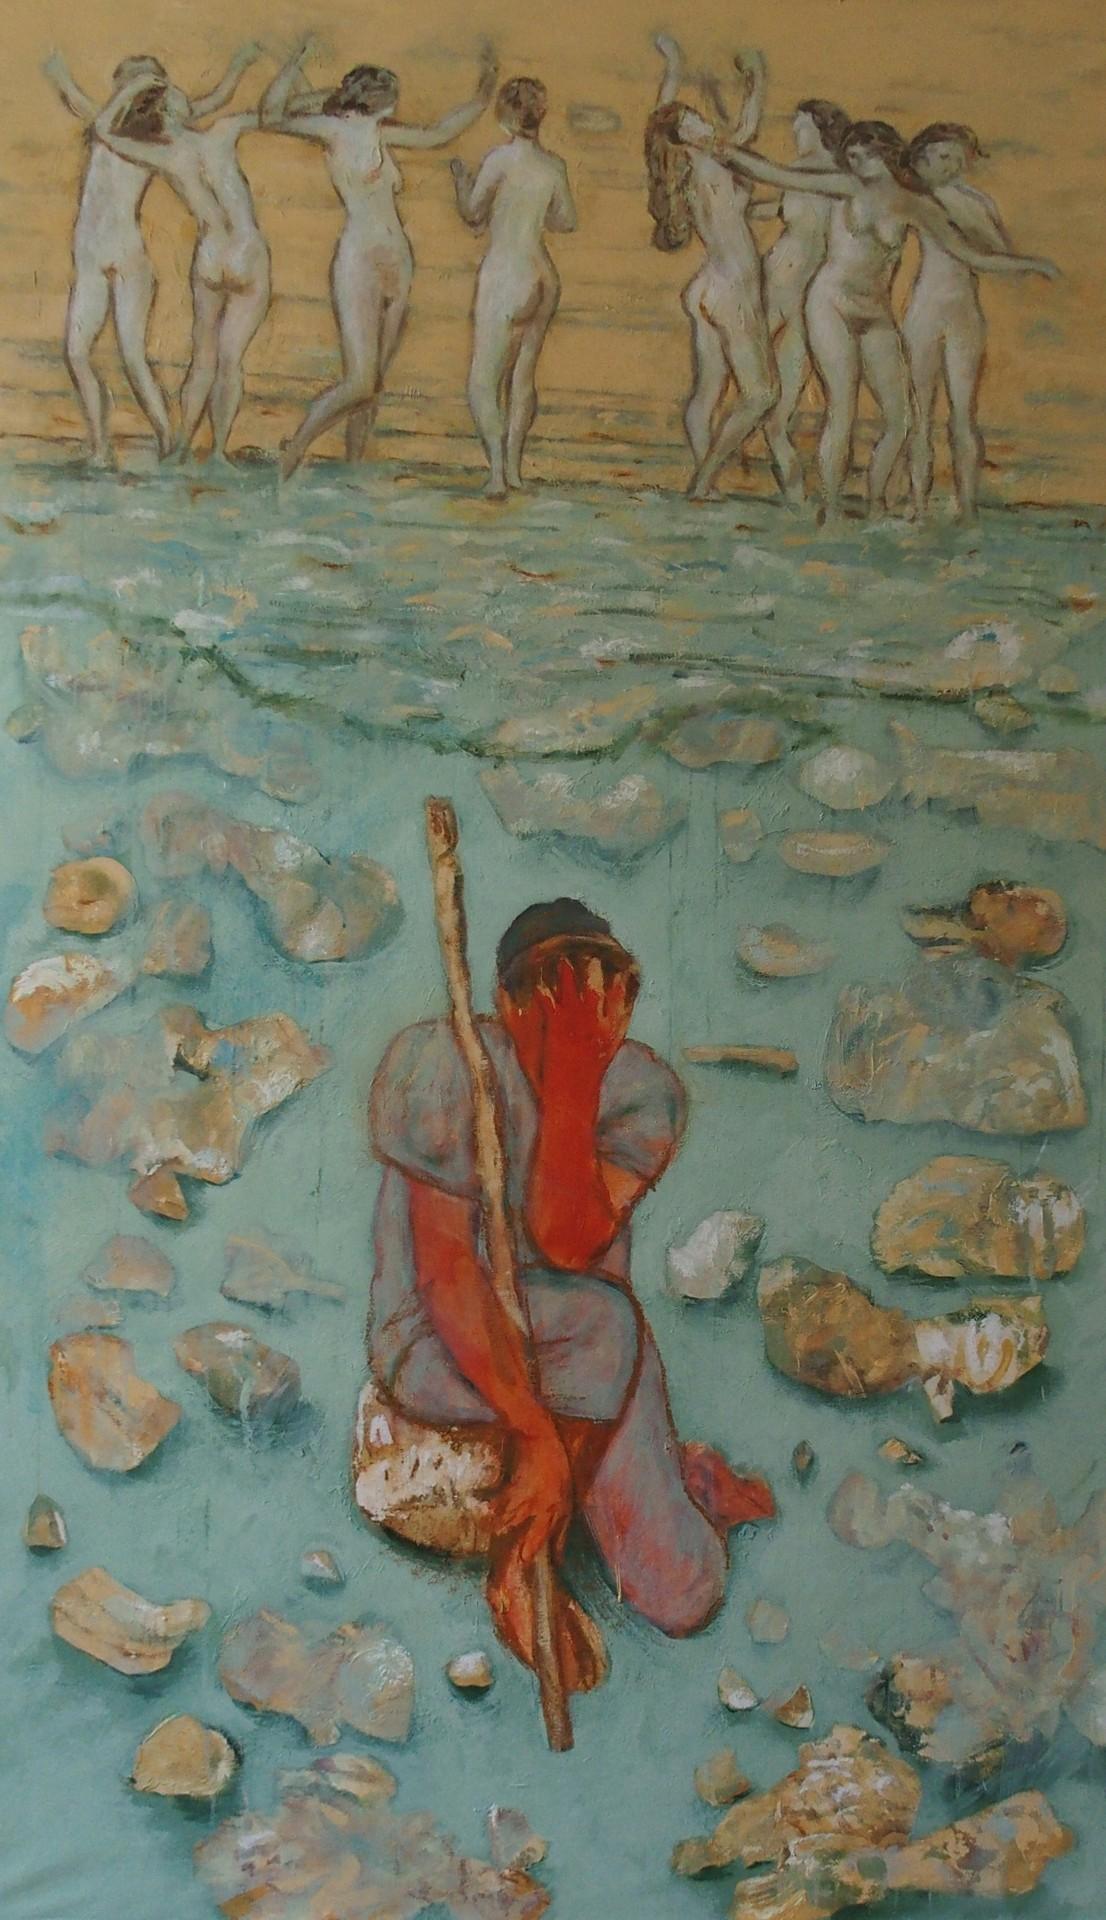 D'après Hodler   2018, Acrylic on canvas, cm.240x150